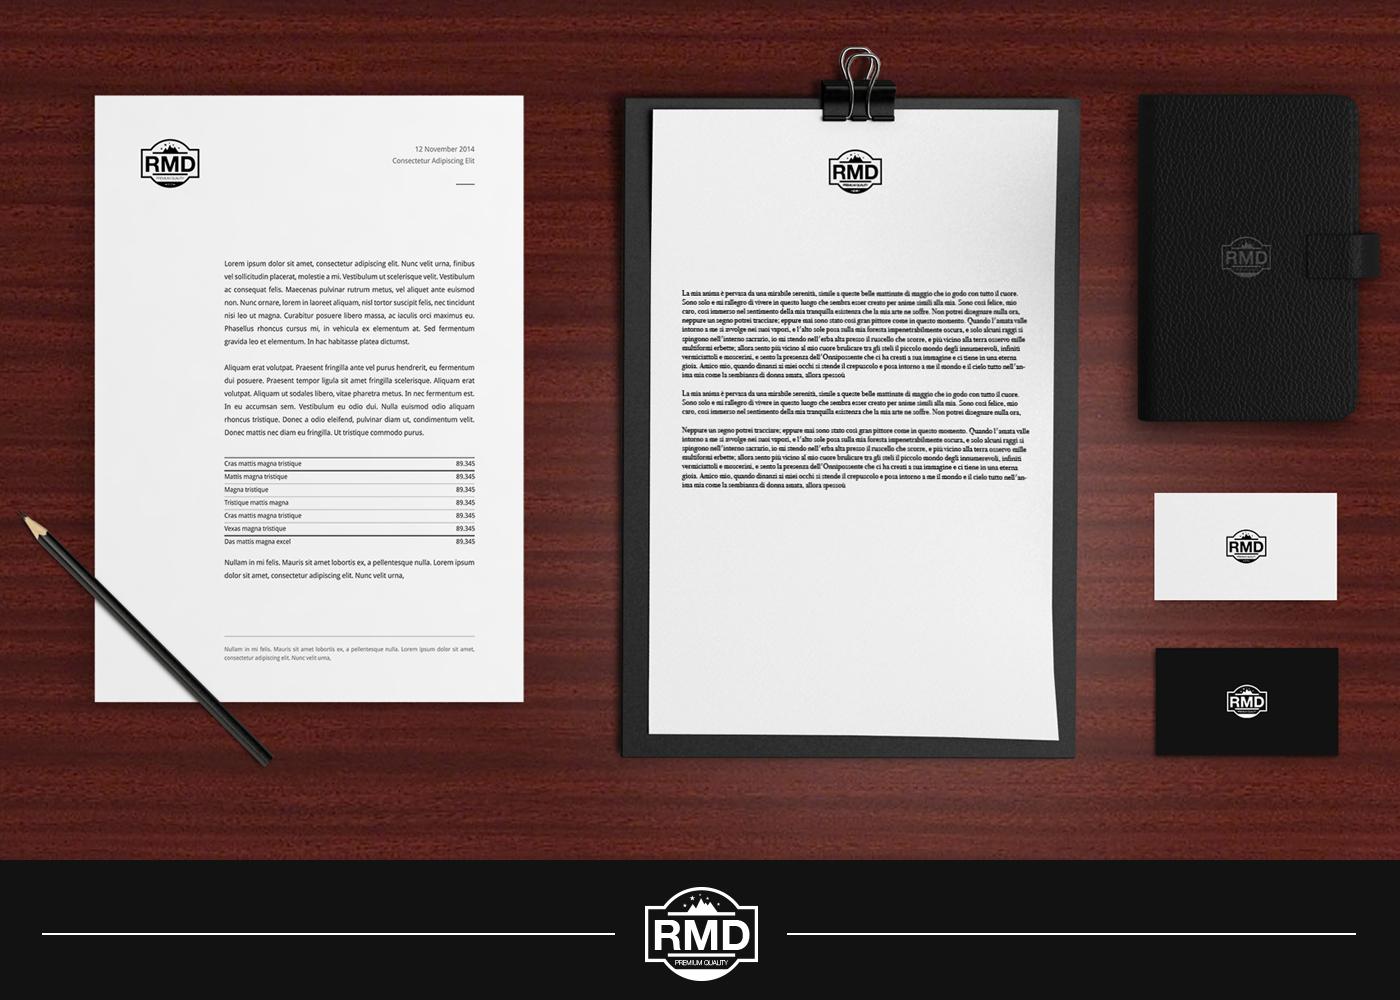 Mockup Office Stationery marketing   pree a4 iBook macbook